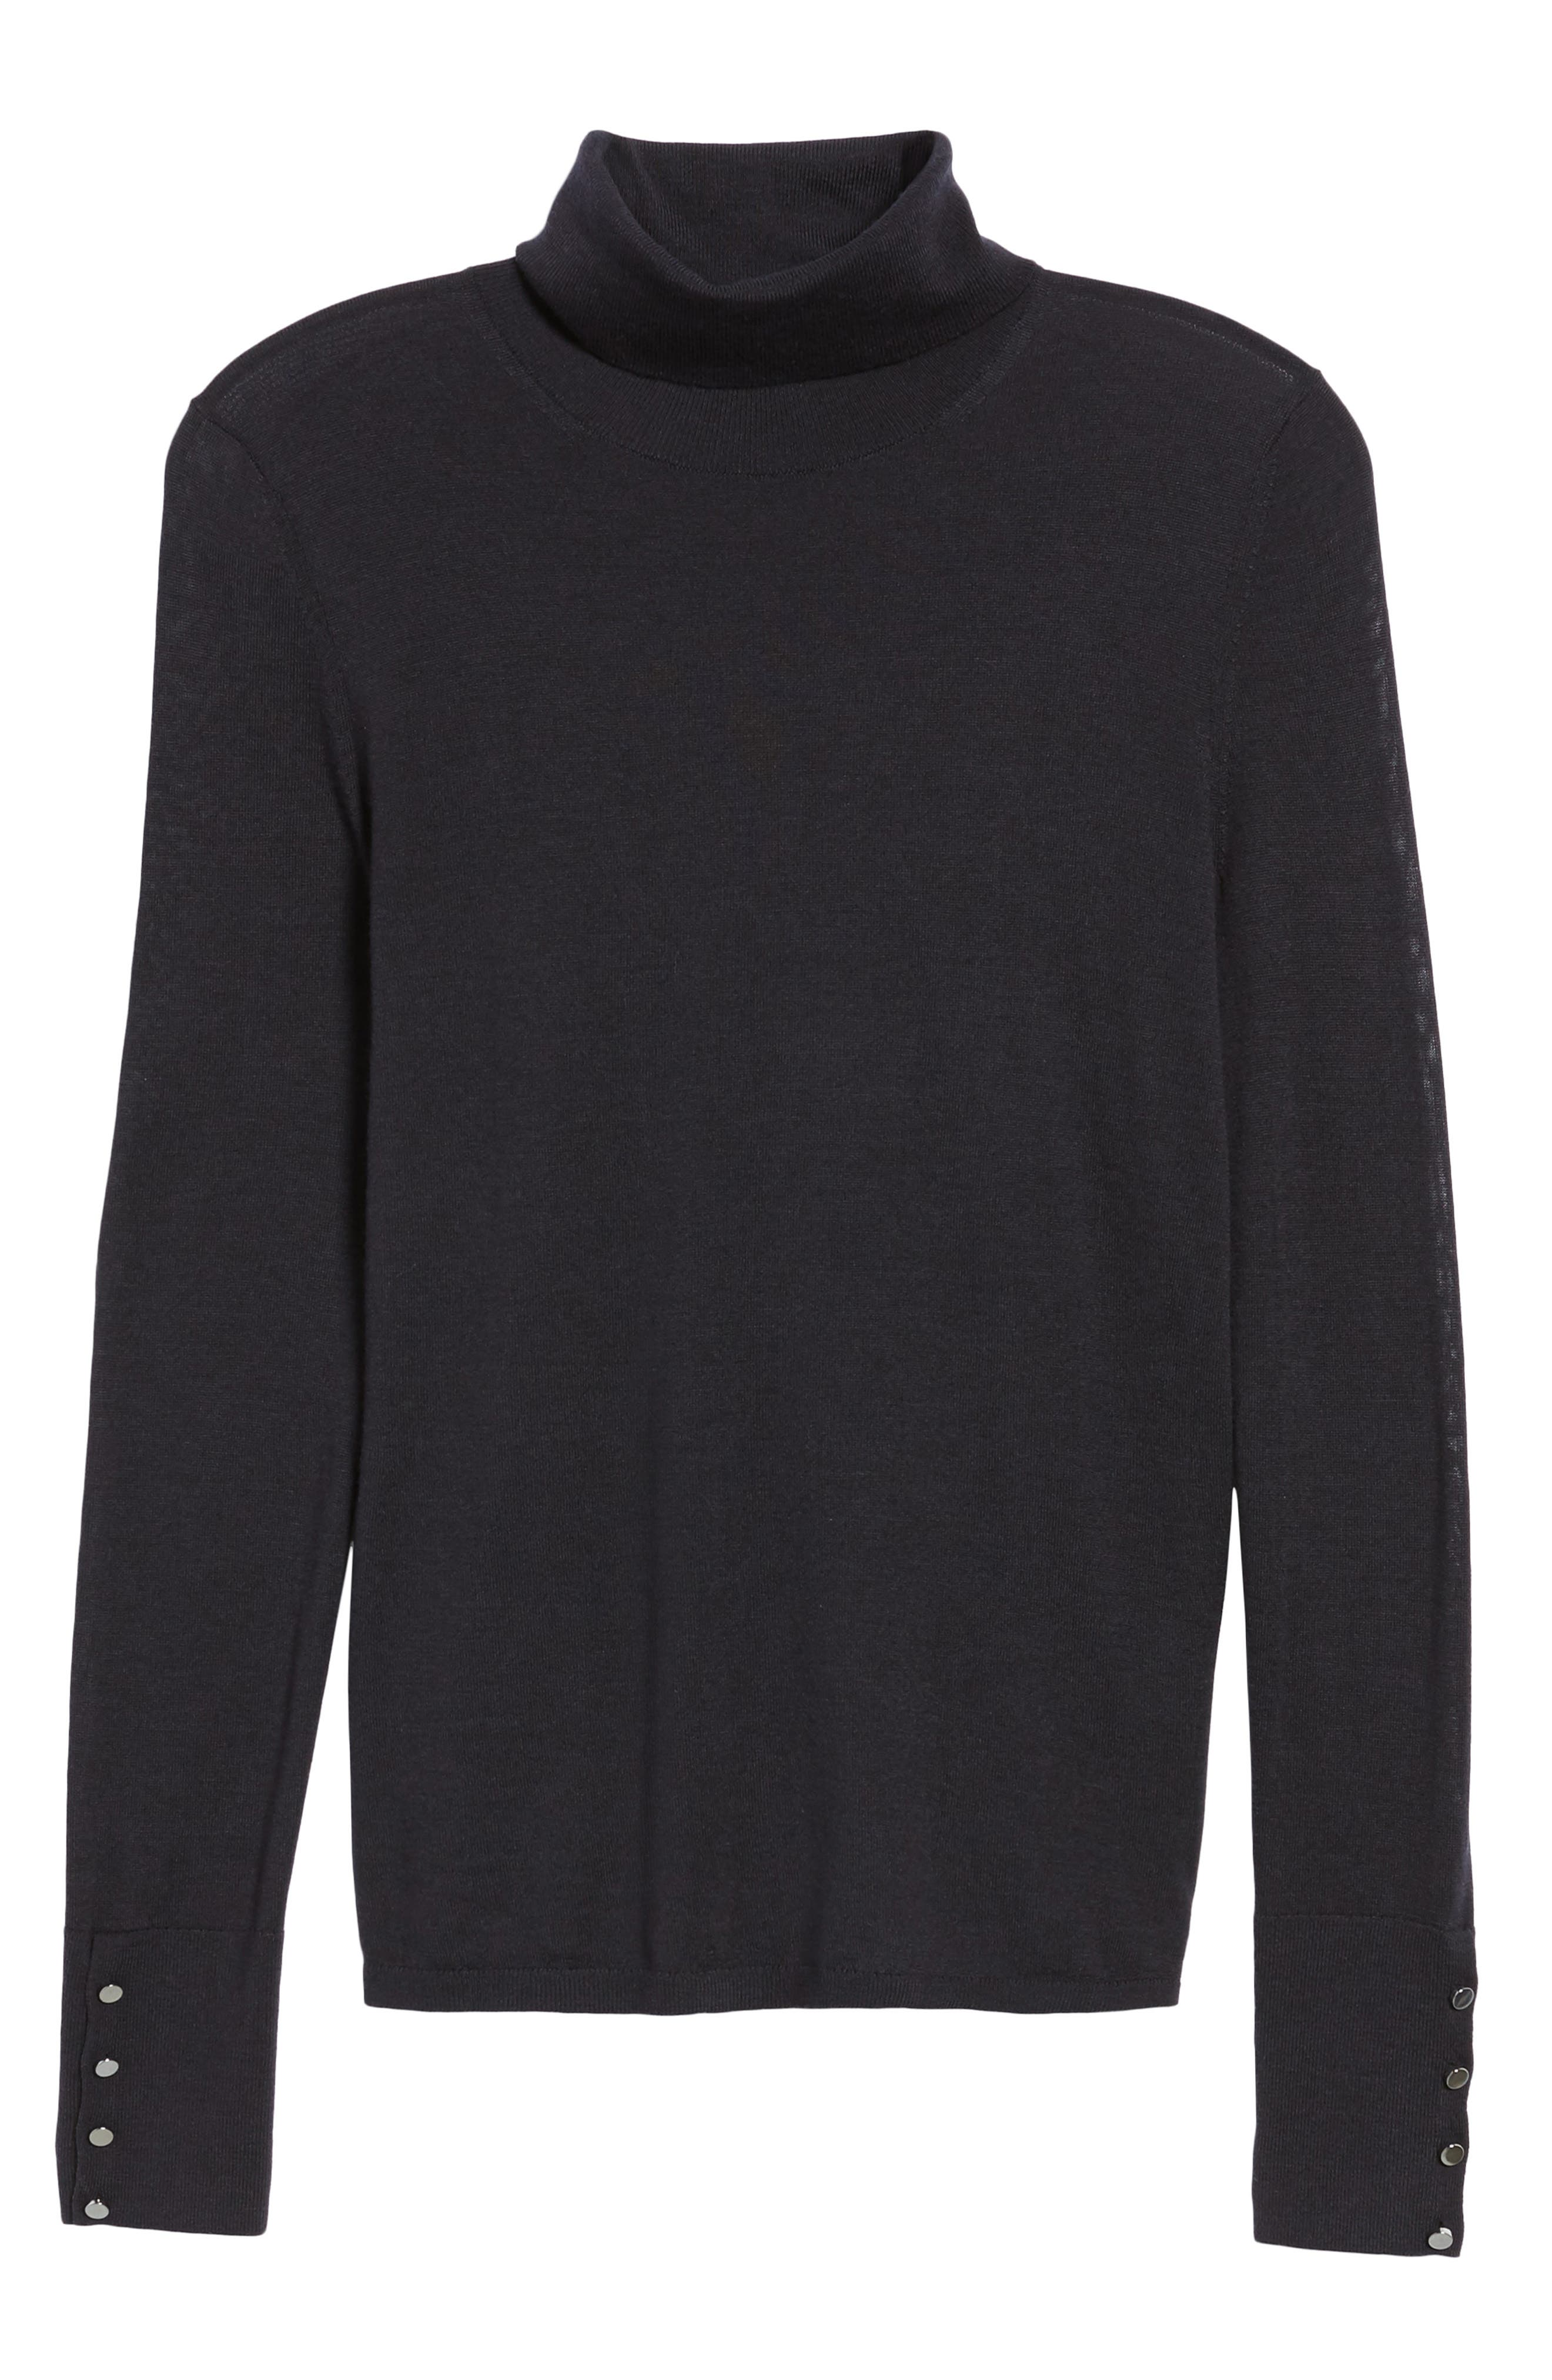 Farrella Wool Turtleneck Sweater,                             Alternate thumbnail 6, color,                             480